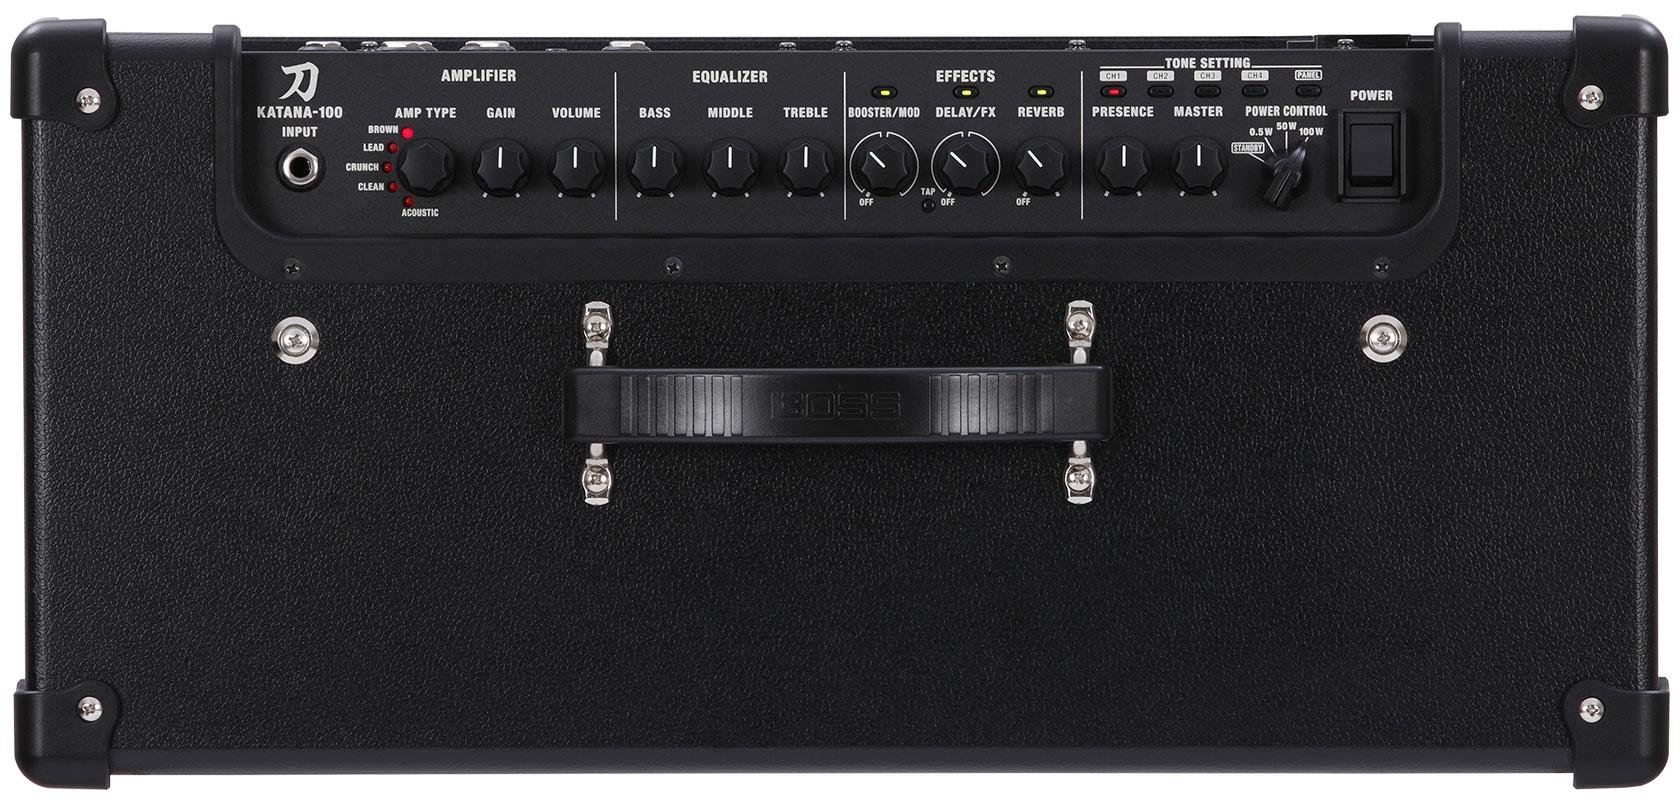 panel de control de amplificador de guitarra BOSS KATANA 100